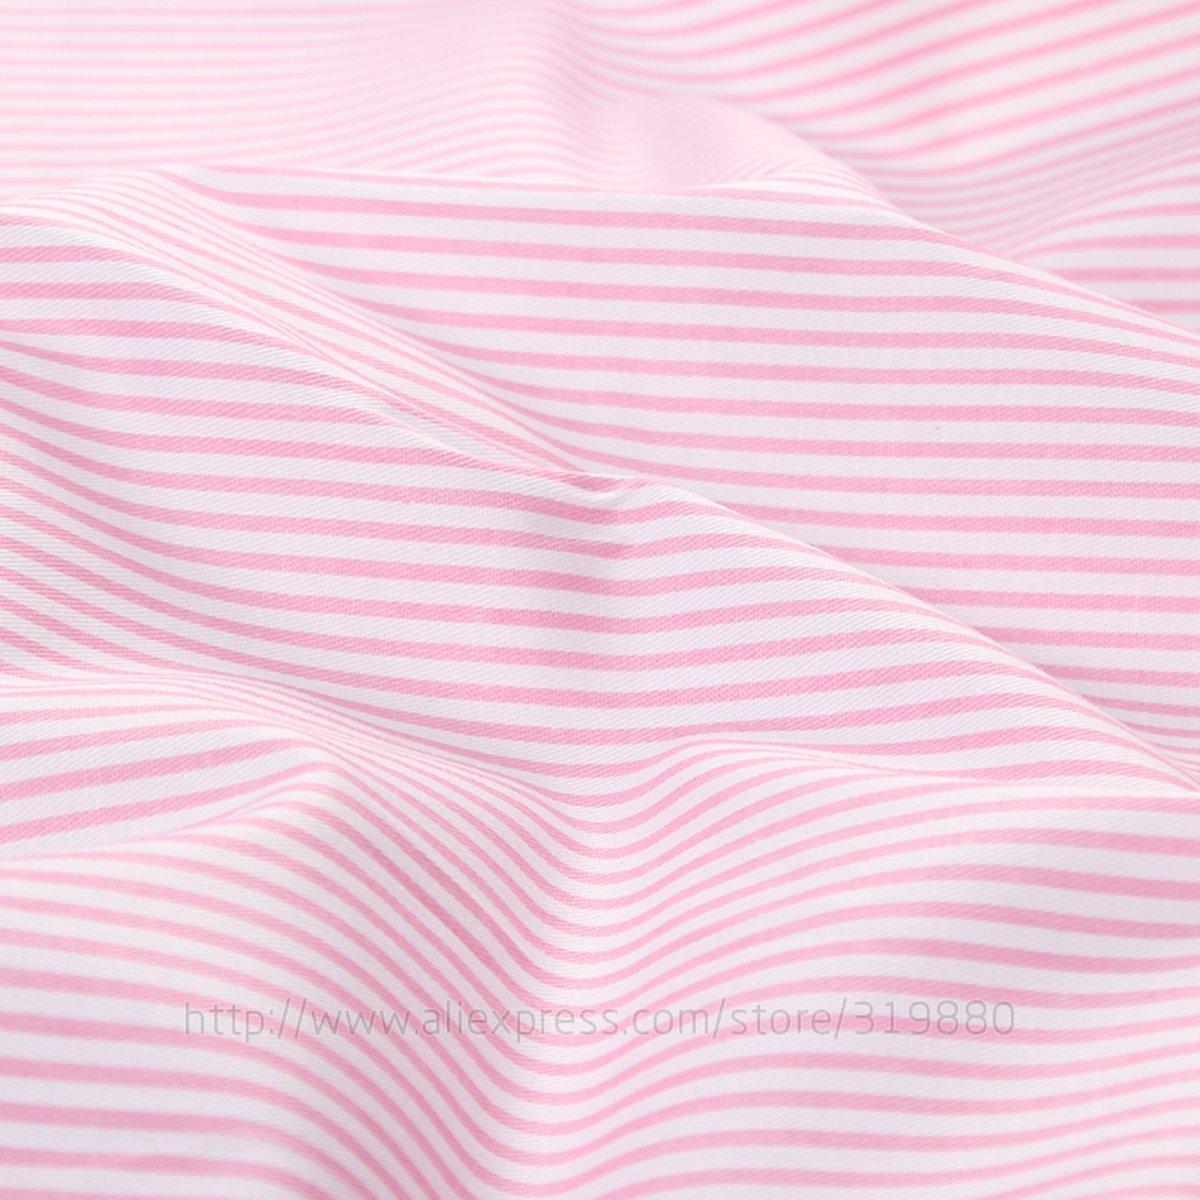 TACOLI - Juego de tela de costura - Tela de edredón - 4 ...